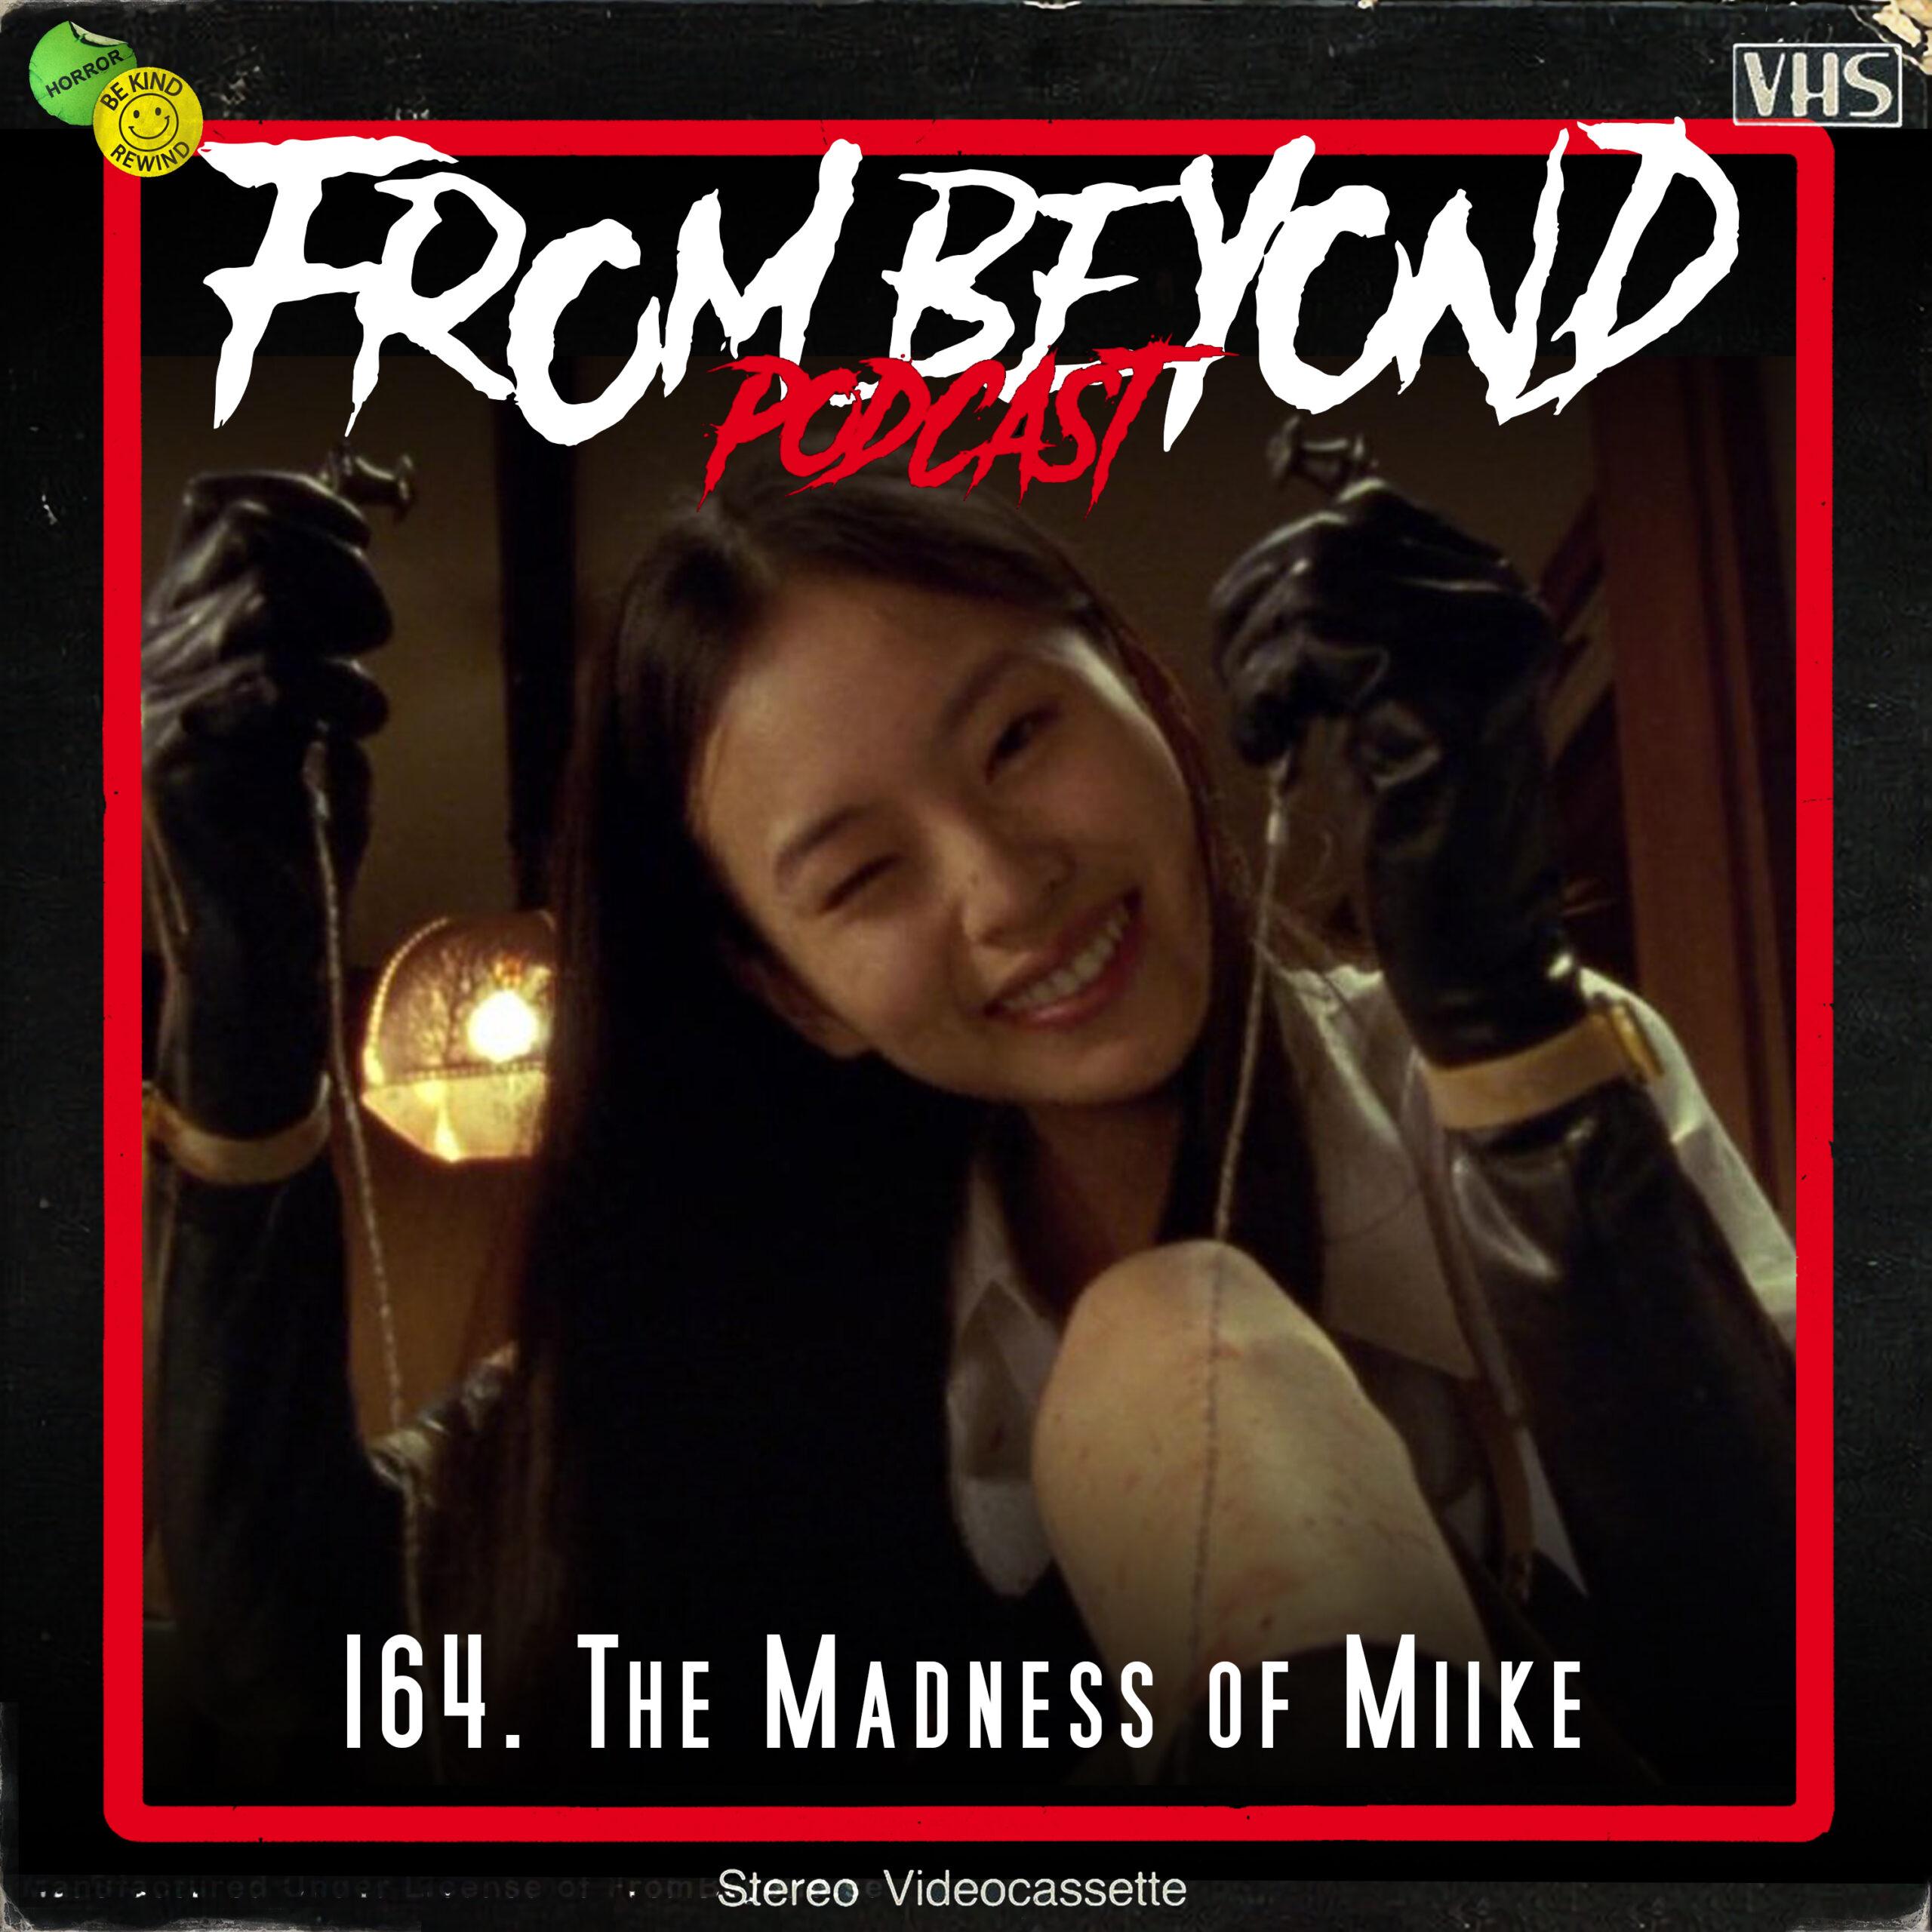 #164 – The Madness of Miike